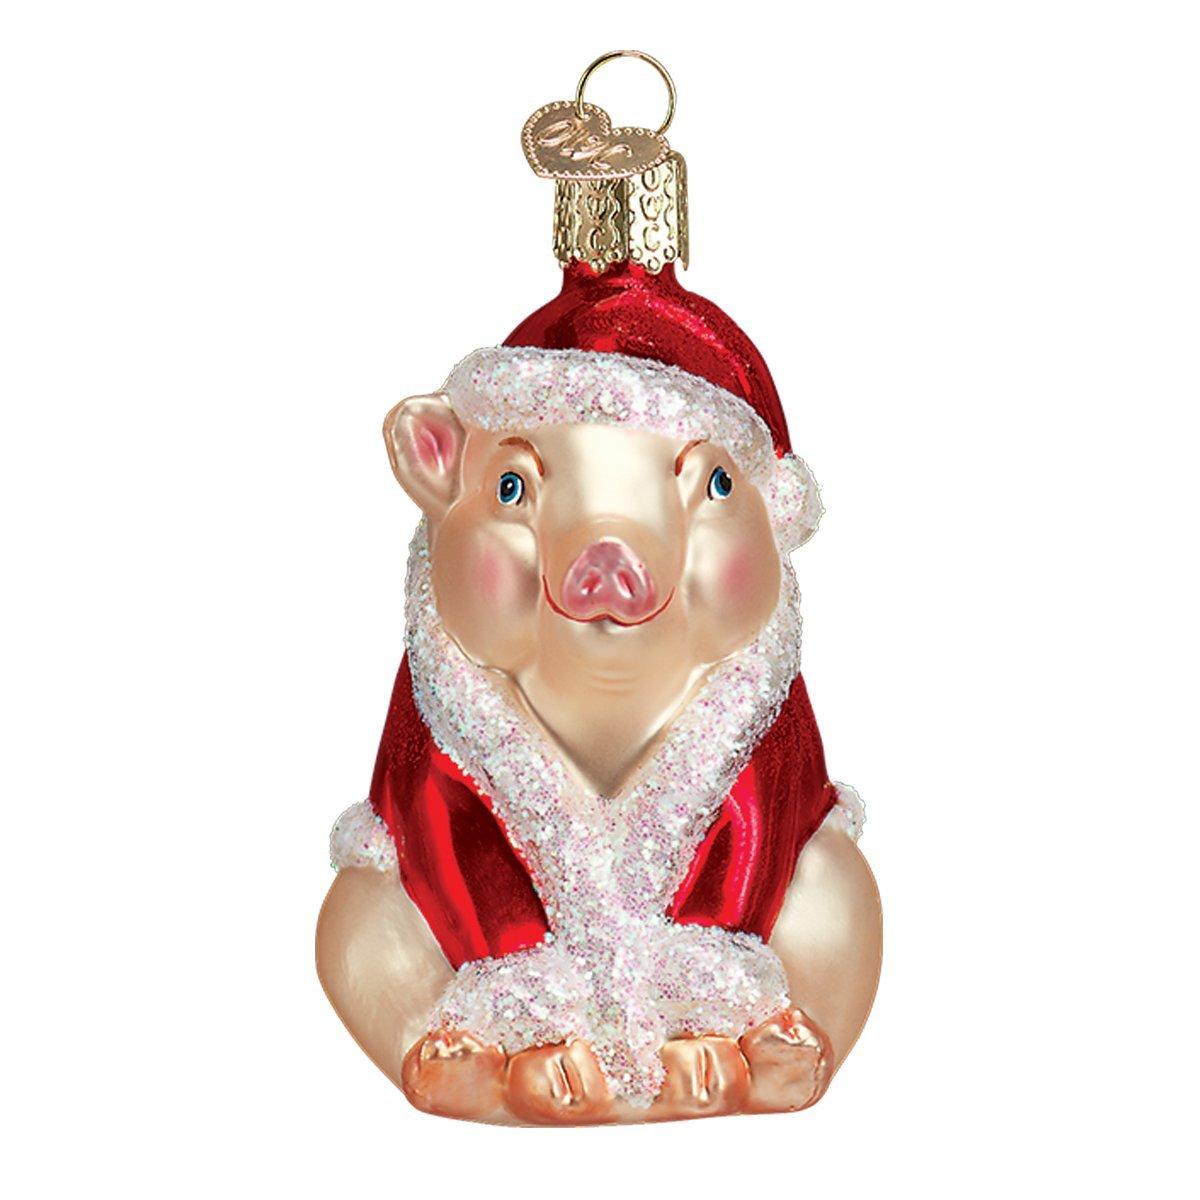 Old World Christmas Ham Glass Blown Ornament